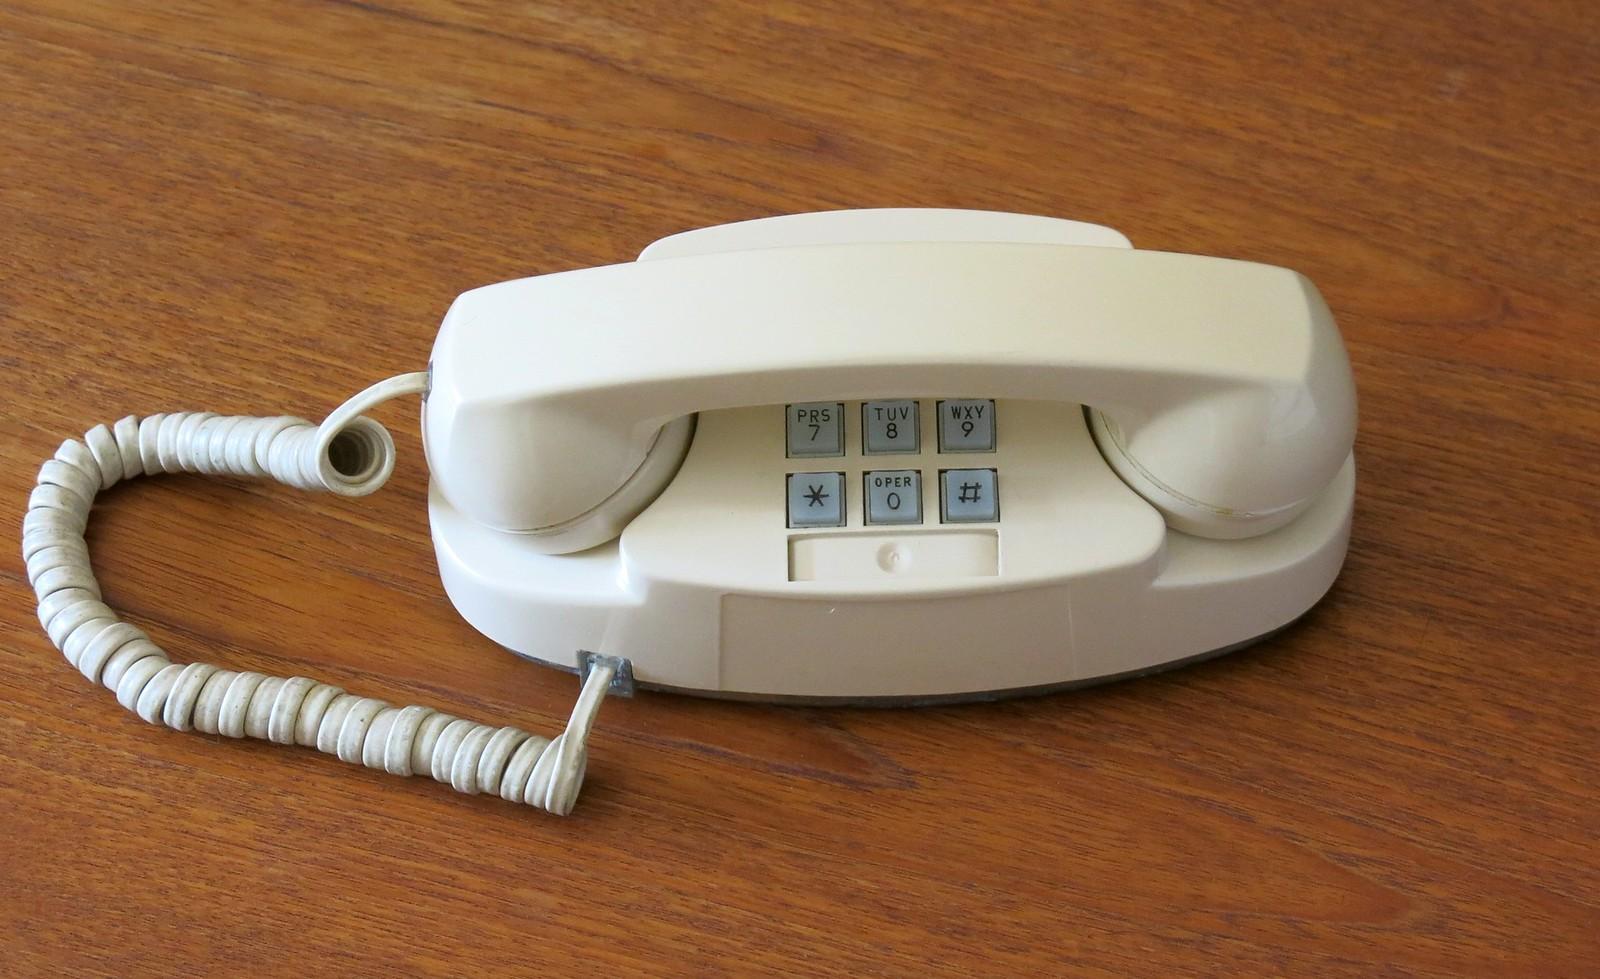 Western Electric Ivory Princess Push Button Phone - circa